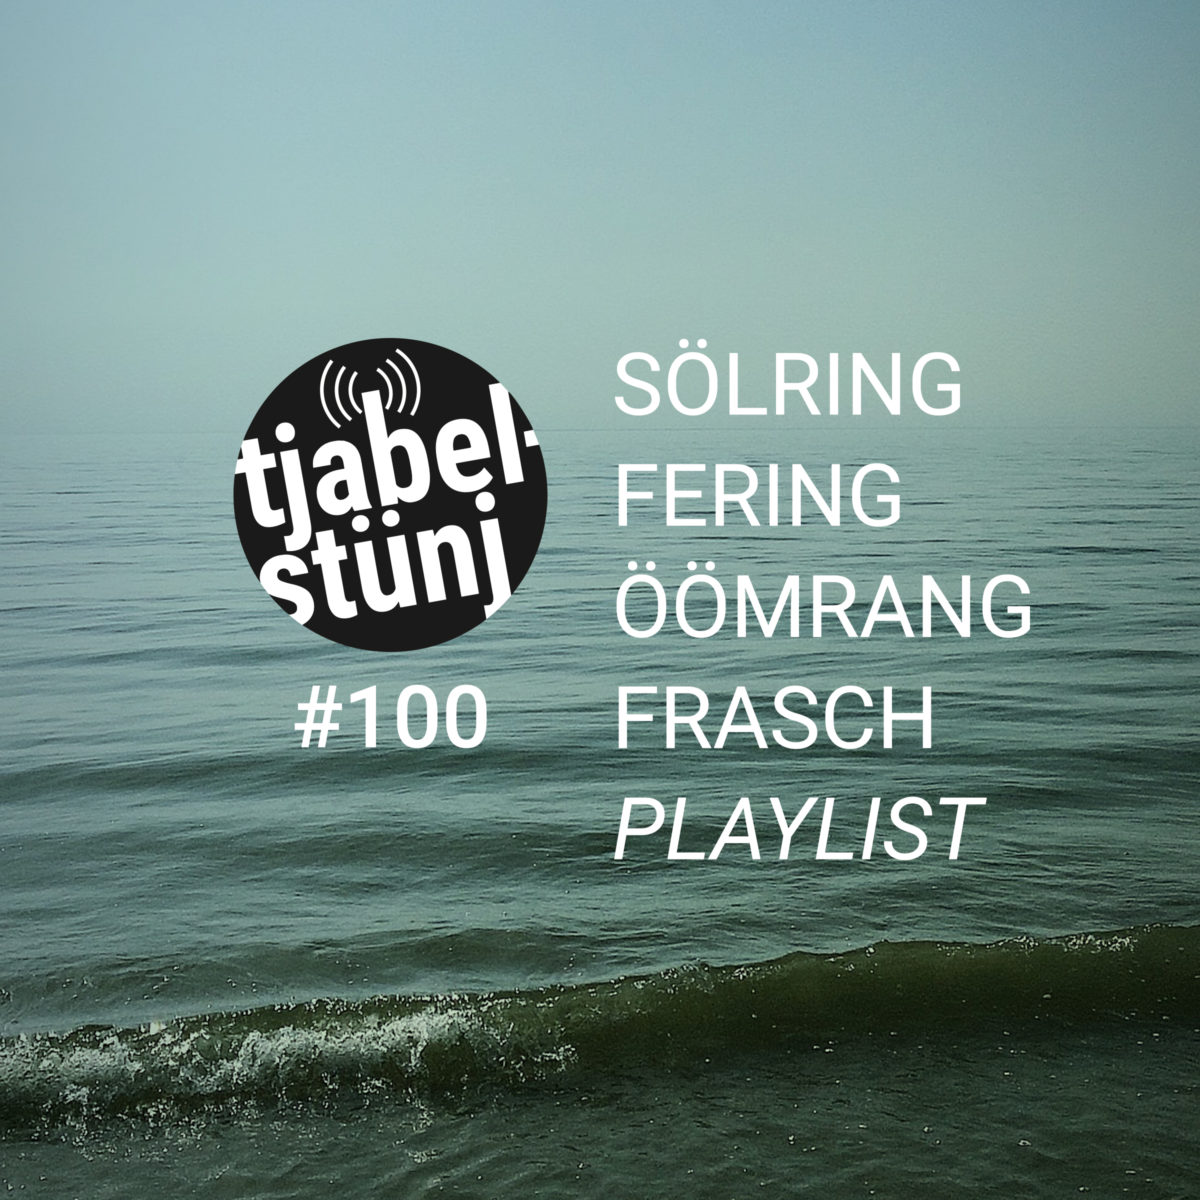 Playlist #100